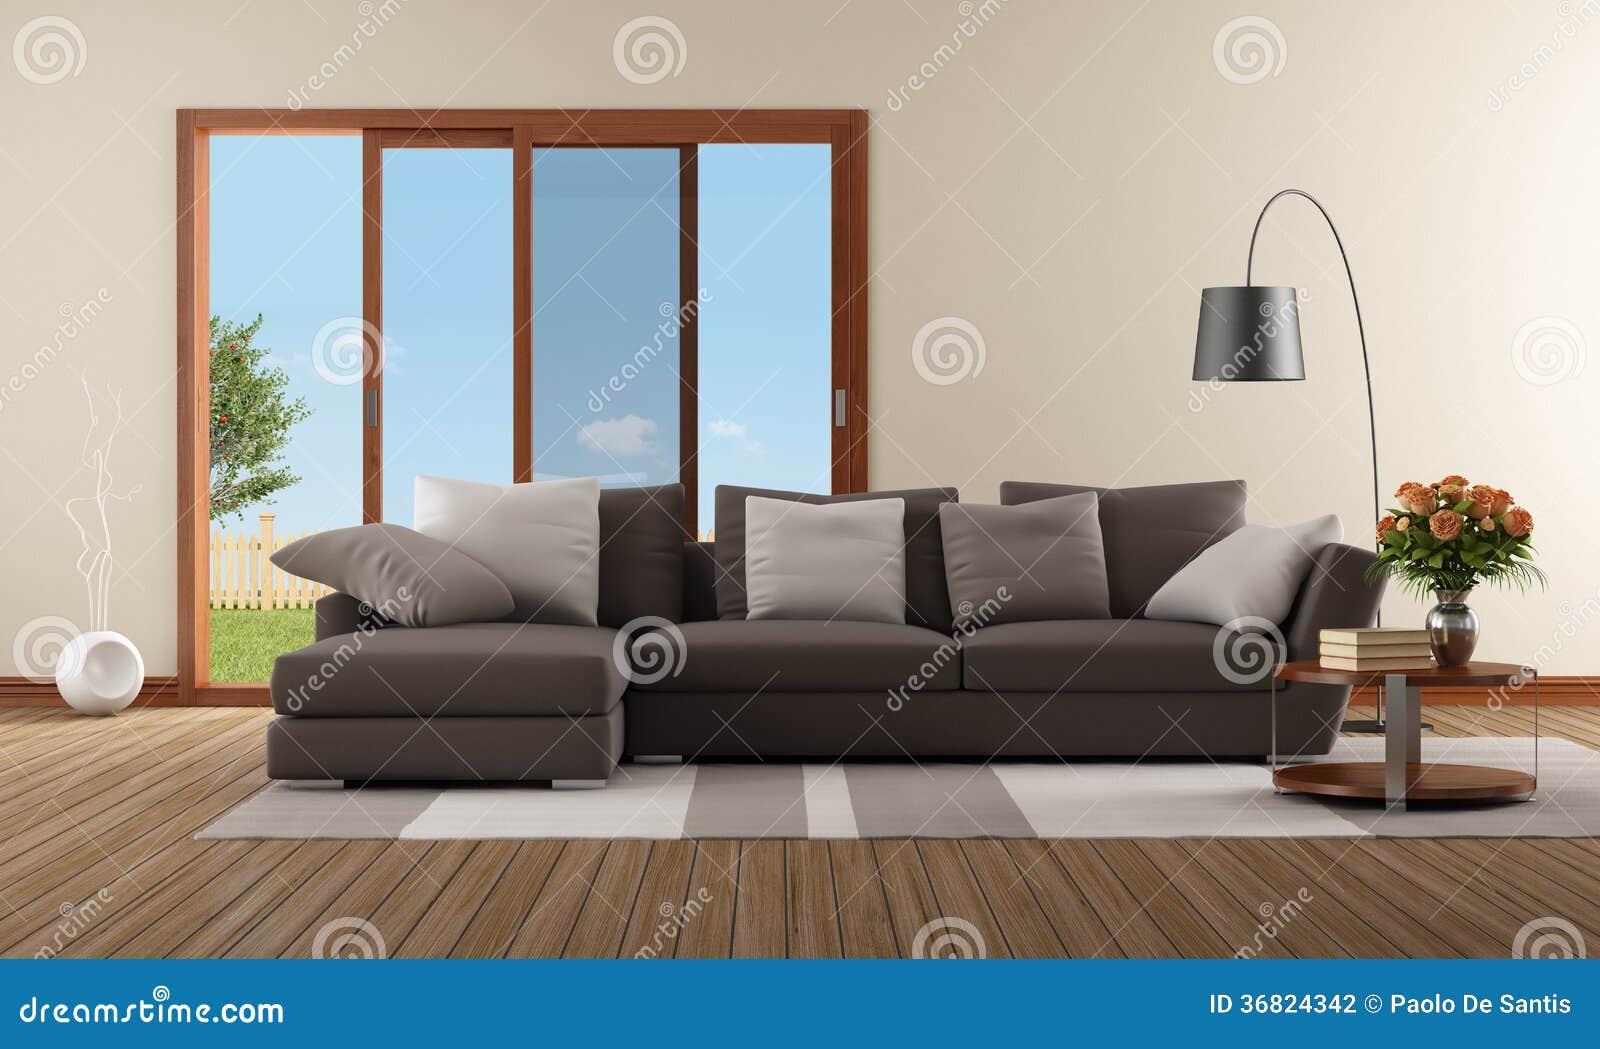 moderne woonkamer met bruine bank stock illustratie afbeelding 36824342. Black Bedroom Furniture Sets. Home Design Ideas